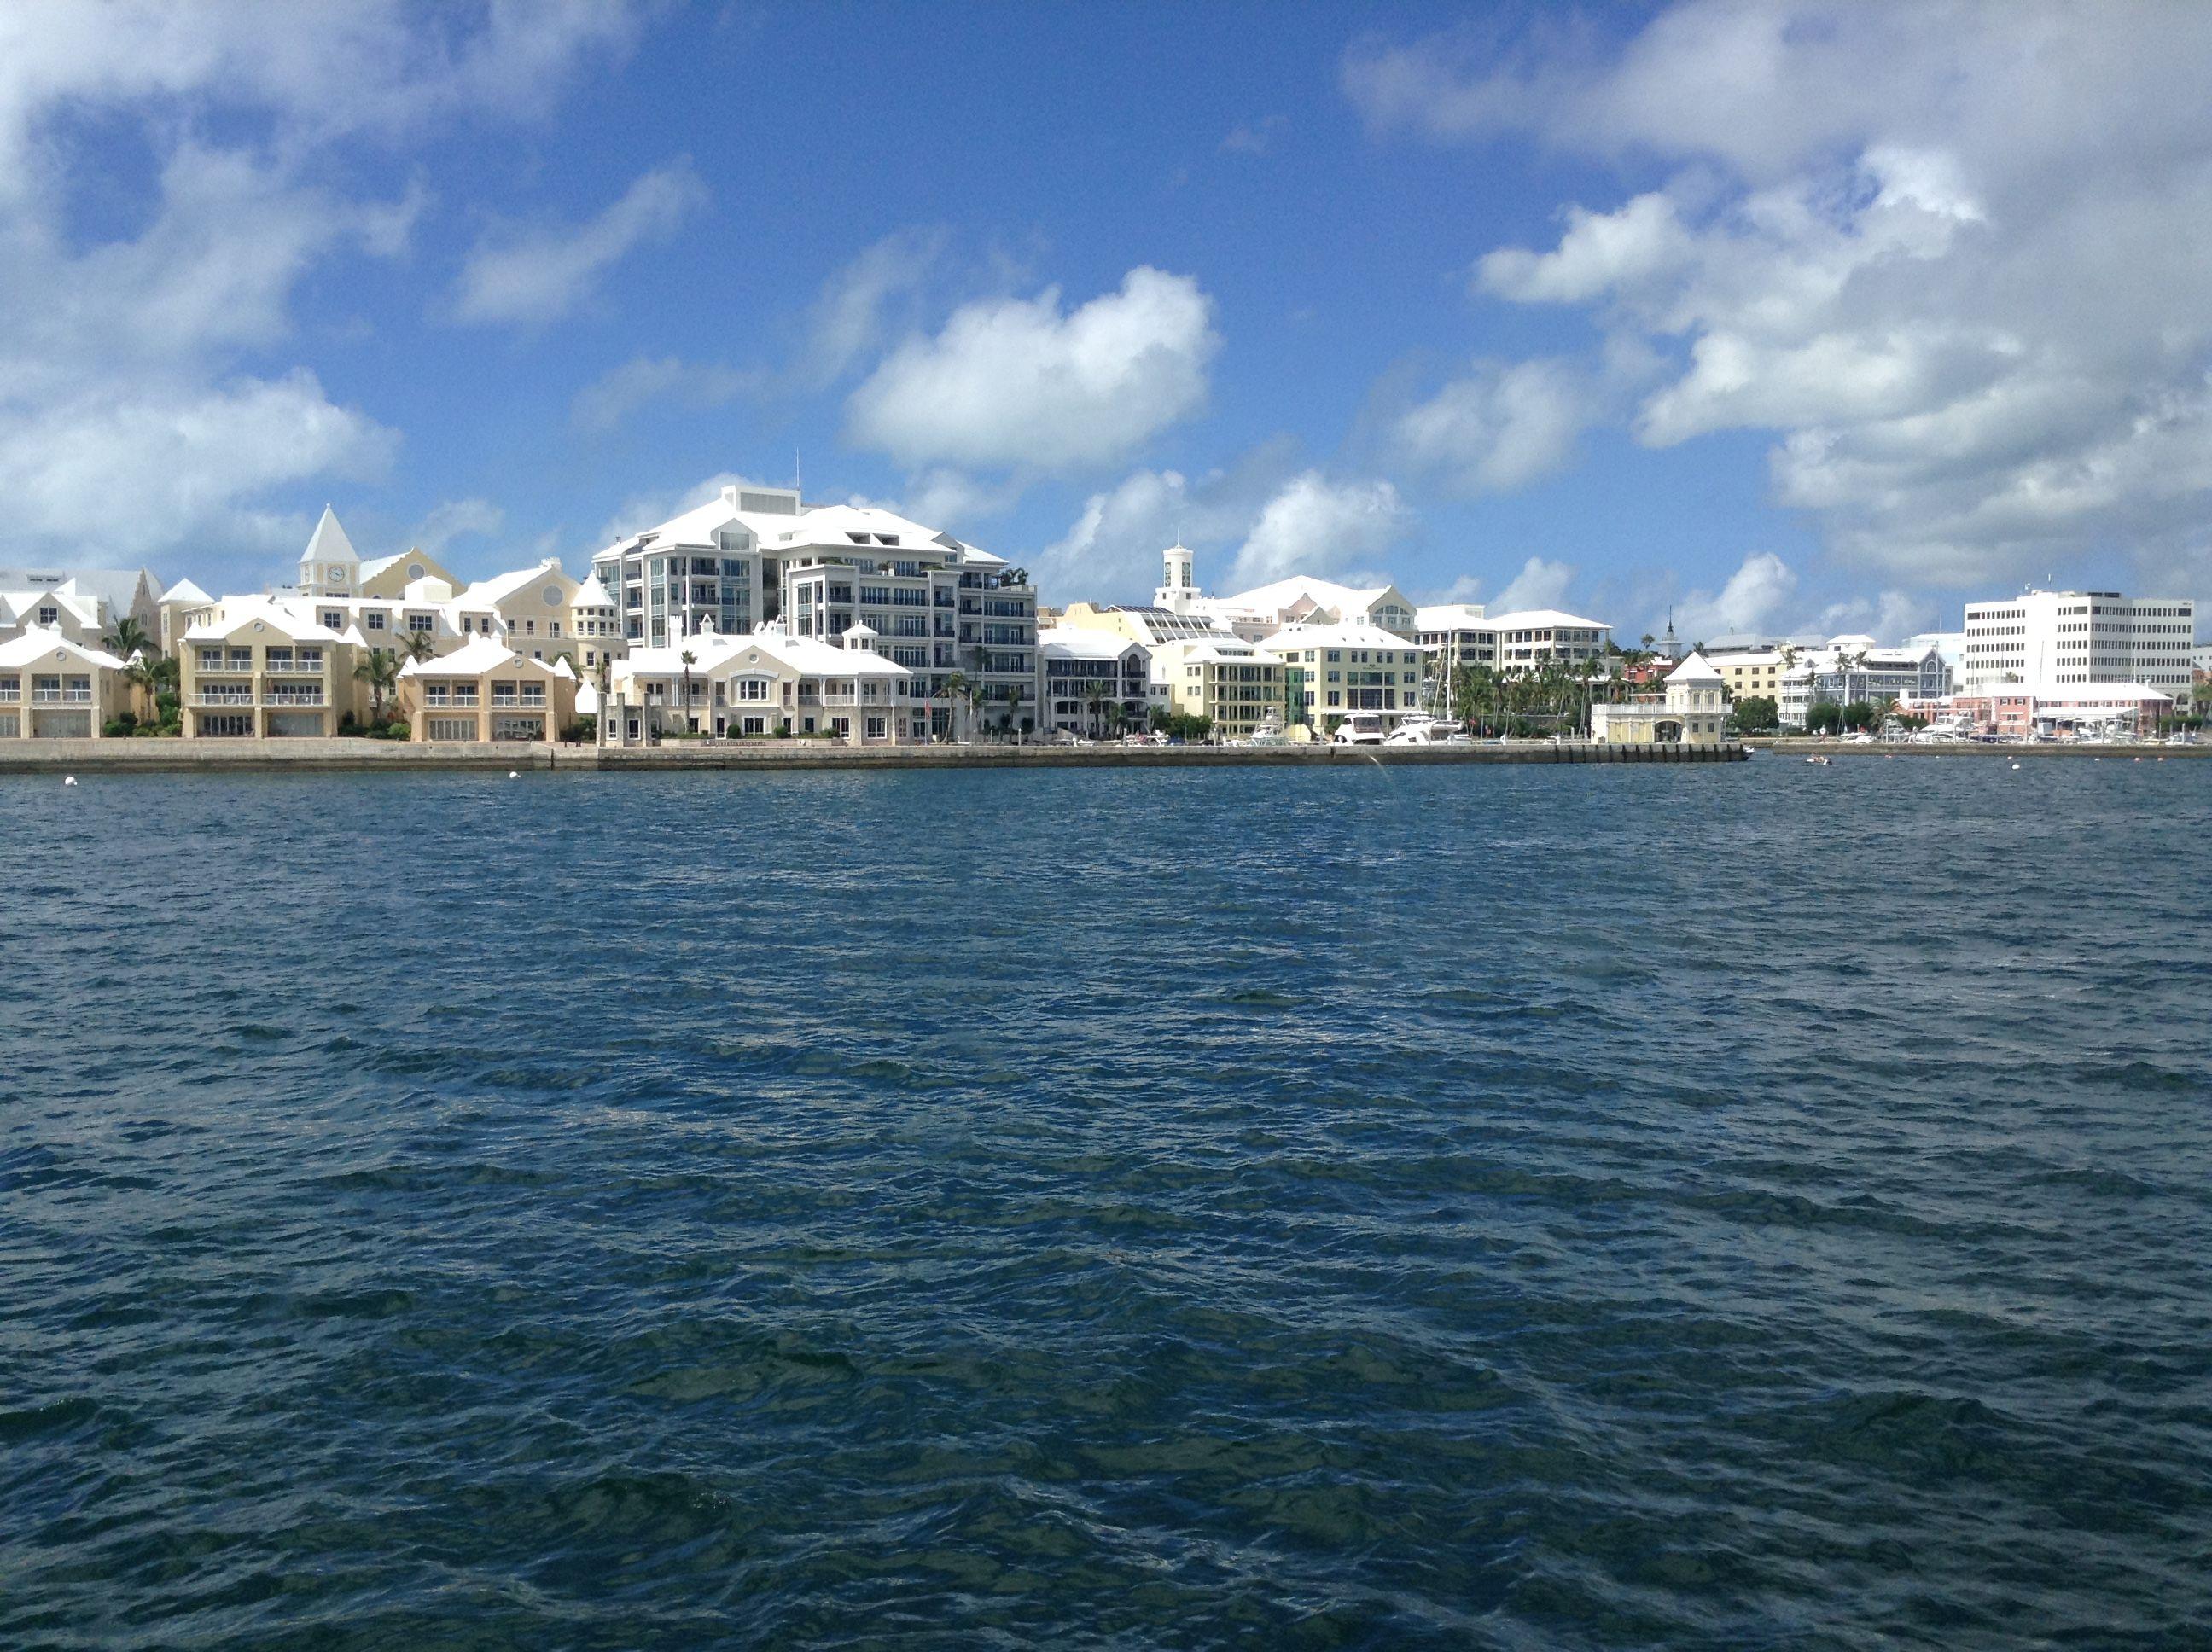 Pin By Valhalla Blue On Bermuda Liv In De Dream At Home A Staycation Golden Beach Rockhampton Beach Scenes [ 1936 x 2592 Pixel ]